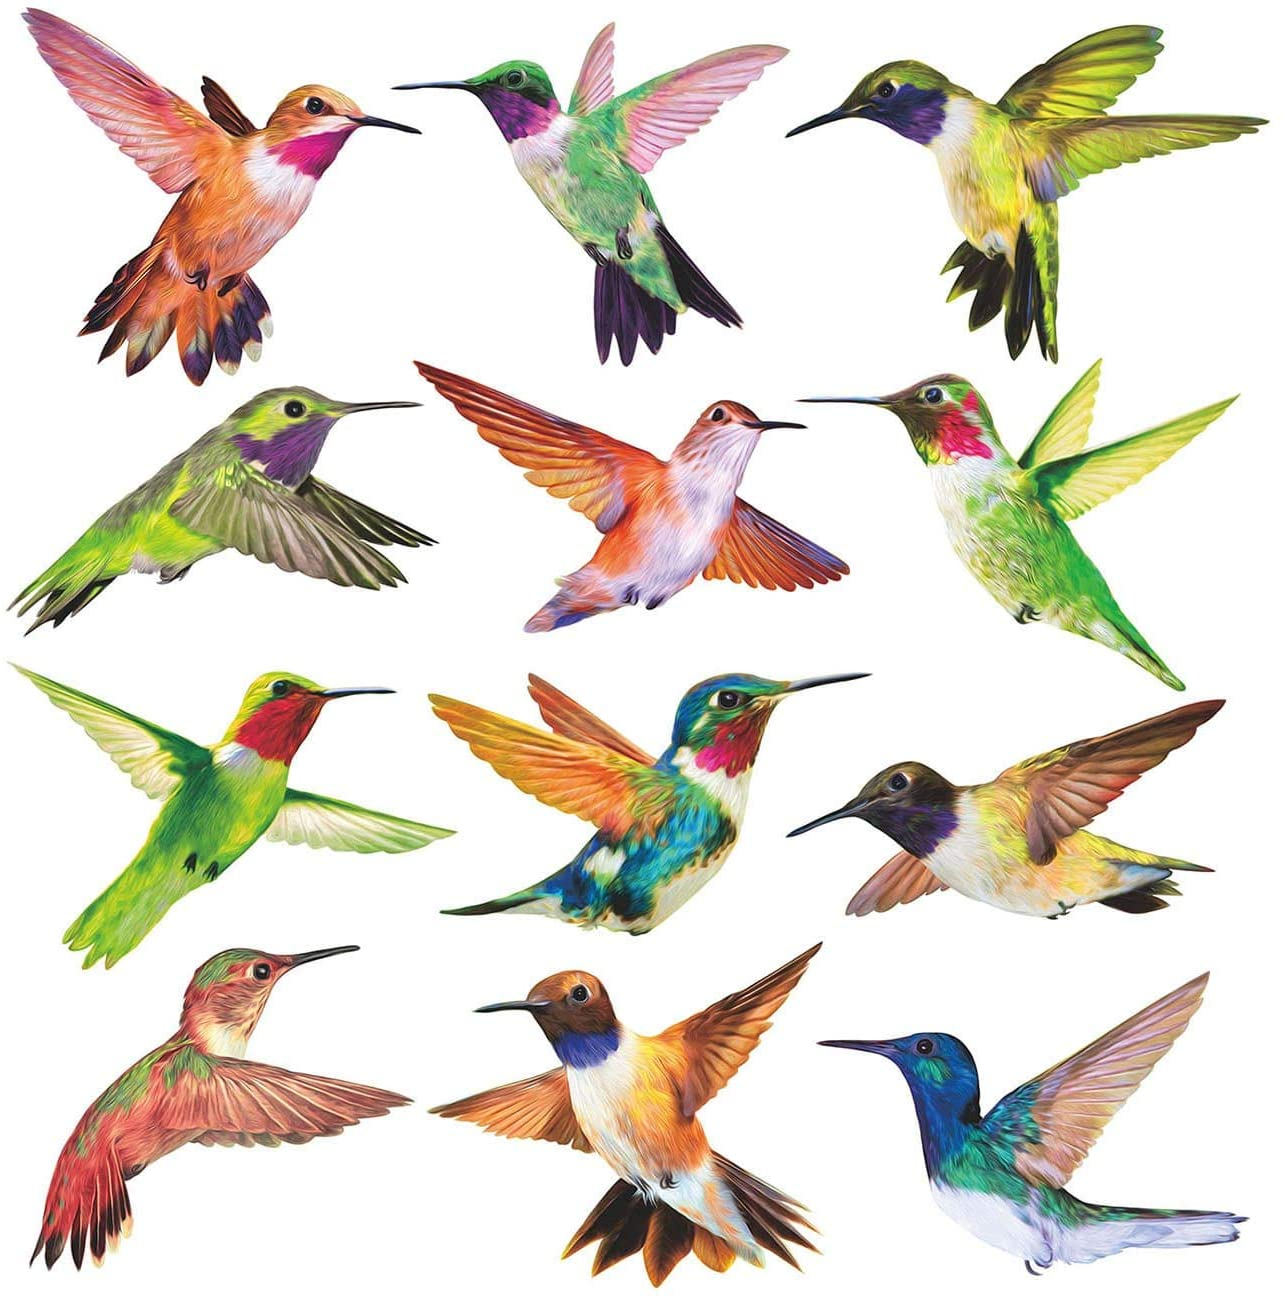 Anti-Collision Window Clings Bird Alert Collision Decals to Prevent Bird Strikes on Window Glass - Set of 12 Hummingbirds